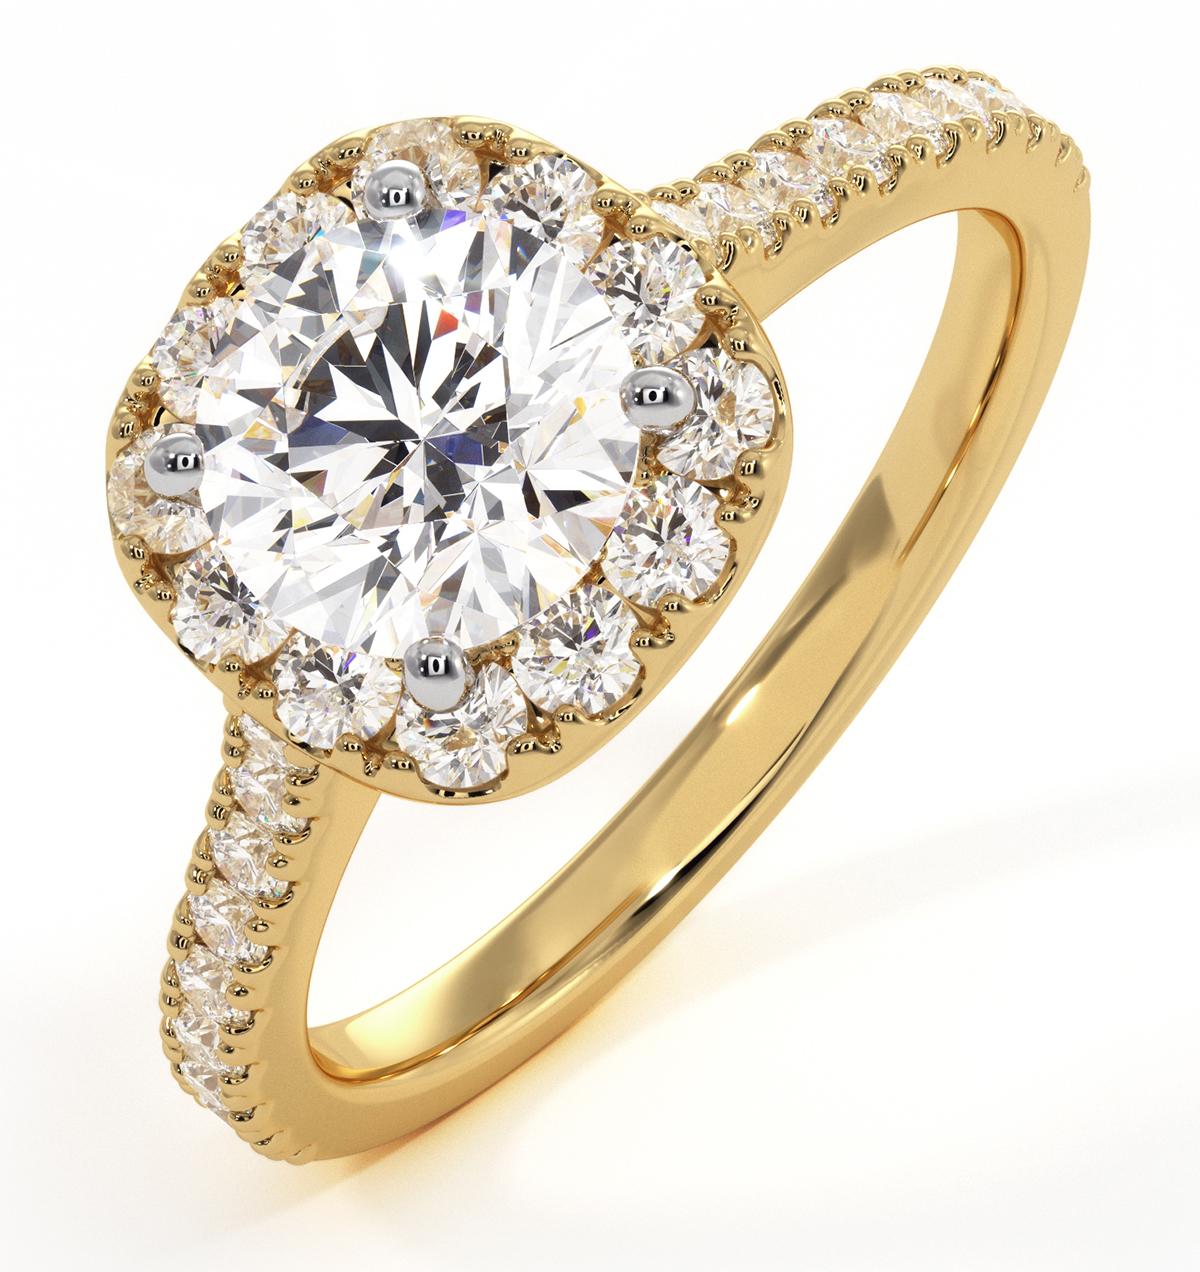 Elizabeth GIA Diamond Halo Engagement Ring in 18K Gold 1.50ct G/SI2 - image 1